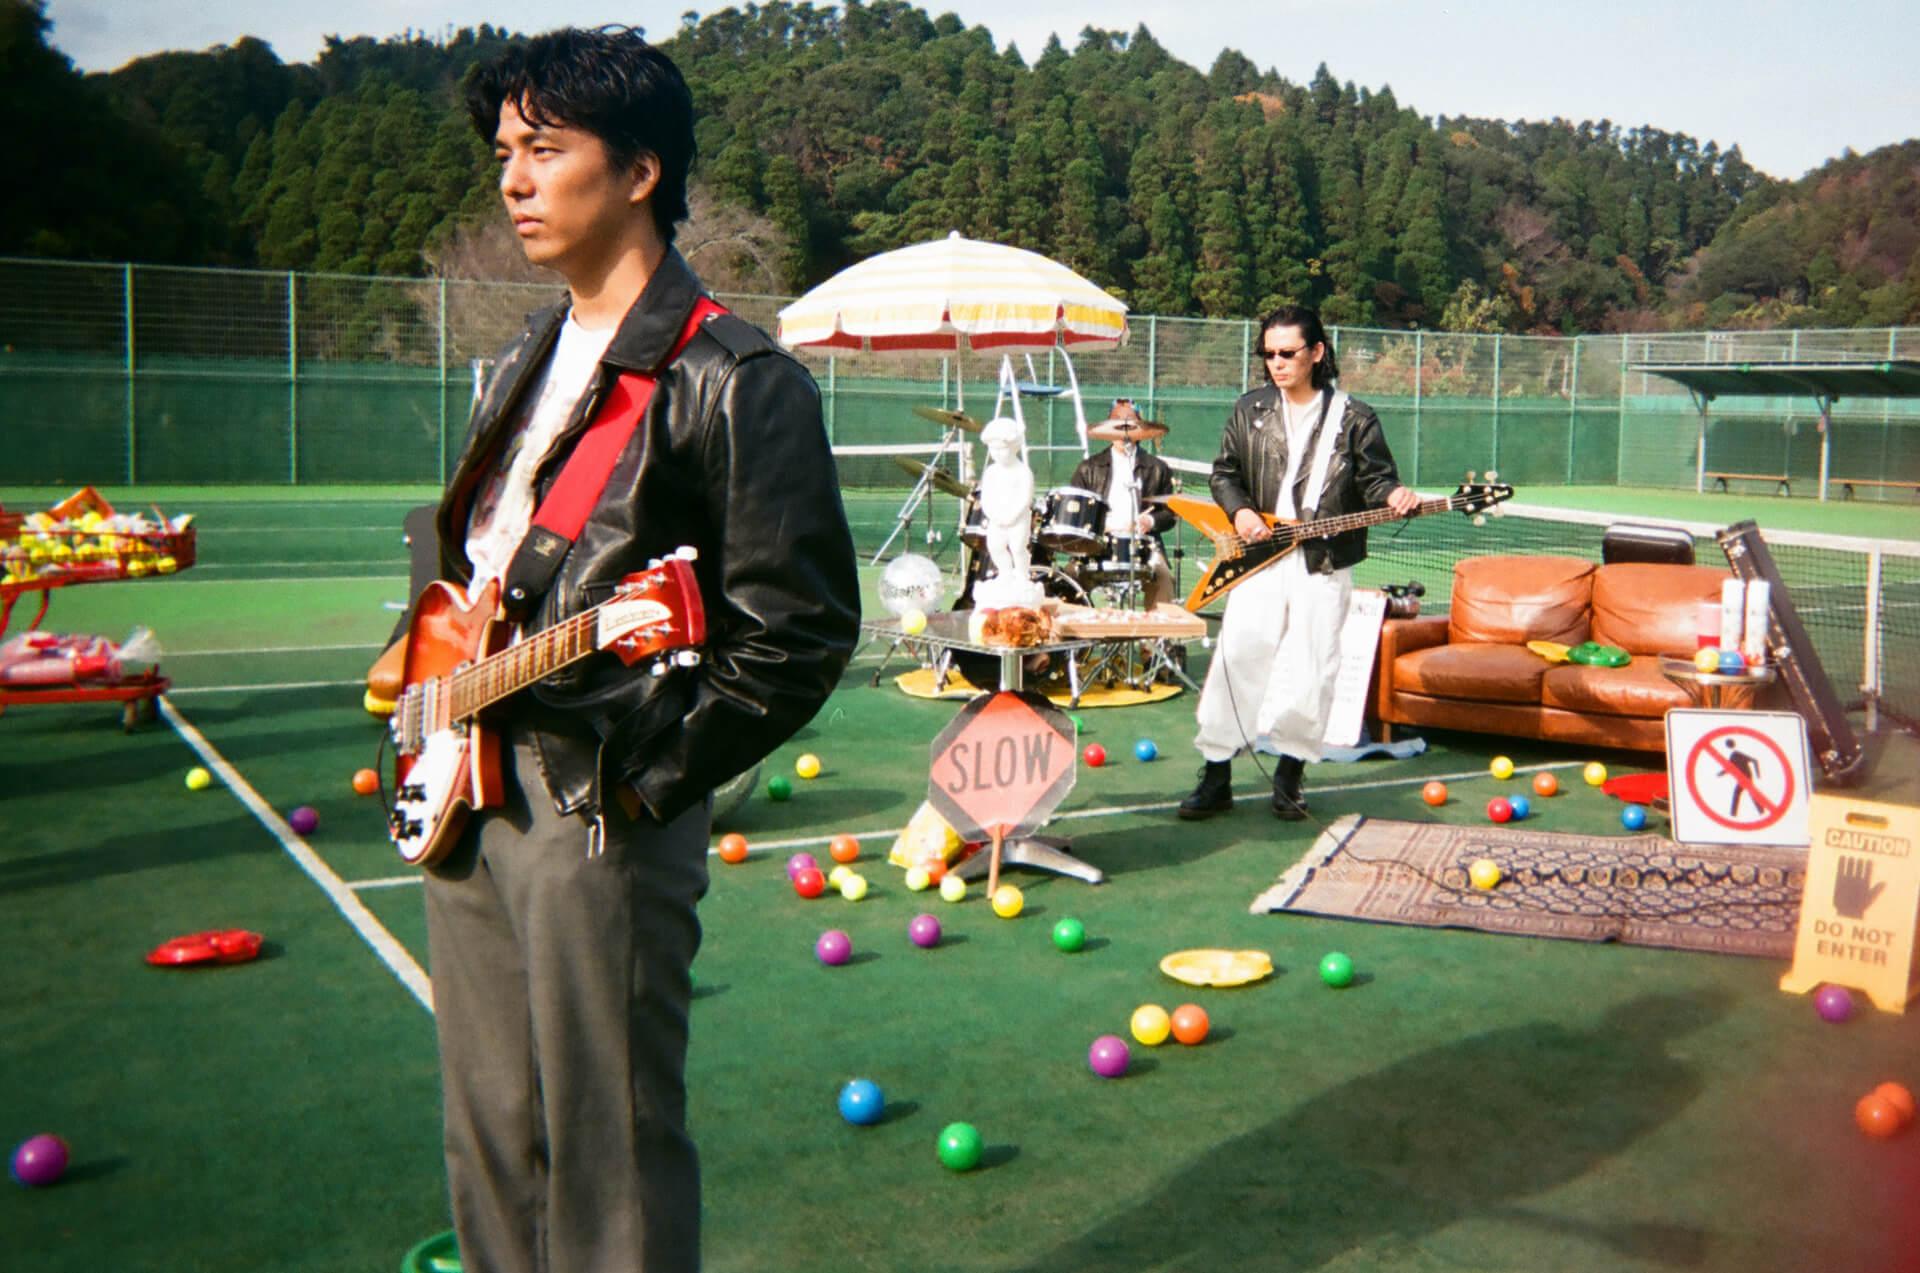 TENDOUJIのBuddy's Q 〜今さら聞けないあの質問〜|vol.2:ドラムの展望と昔の仕事 music210107_TENDOUJI-01